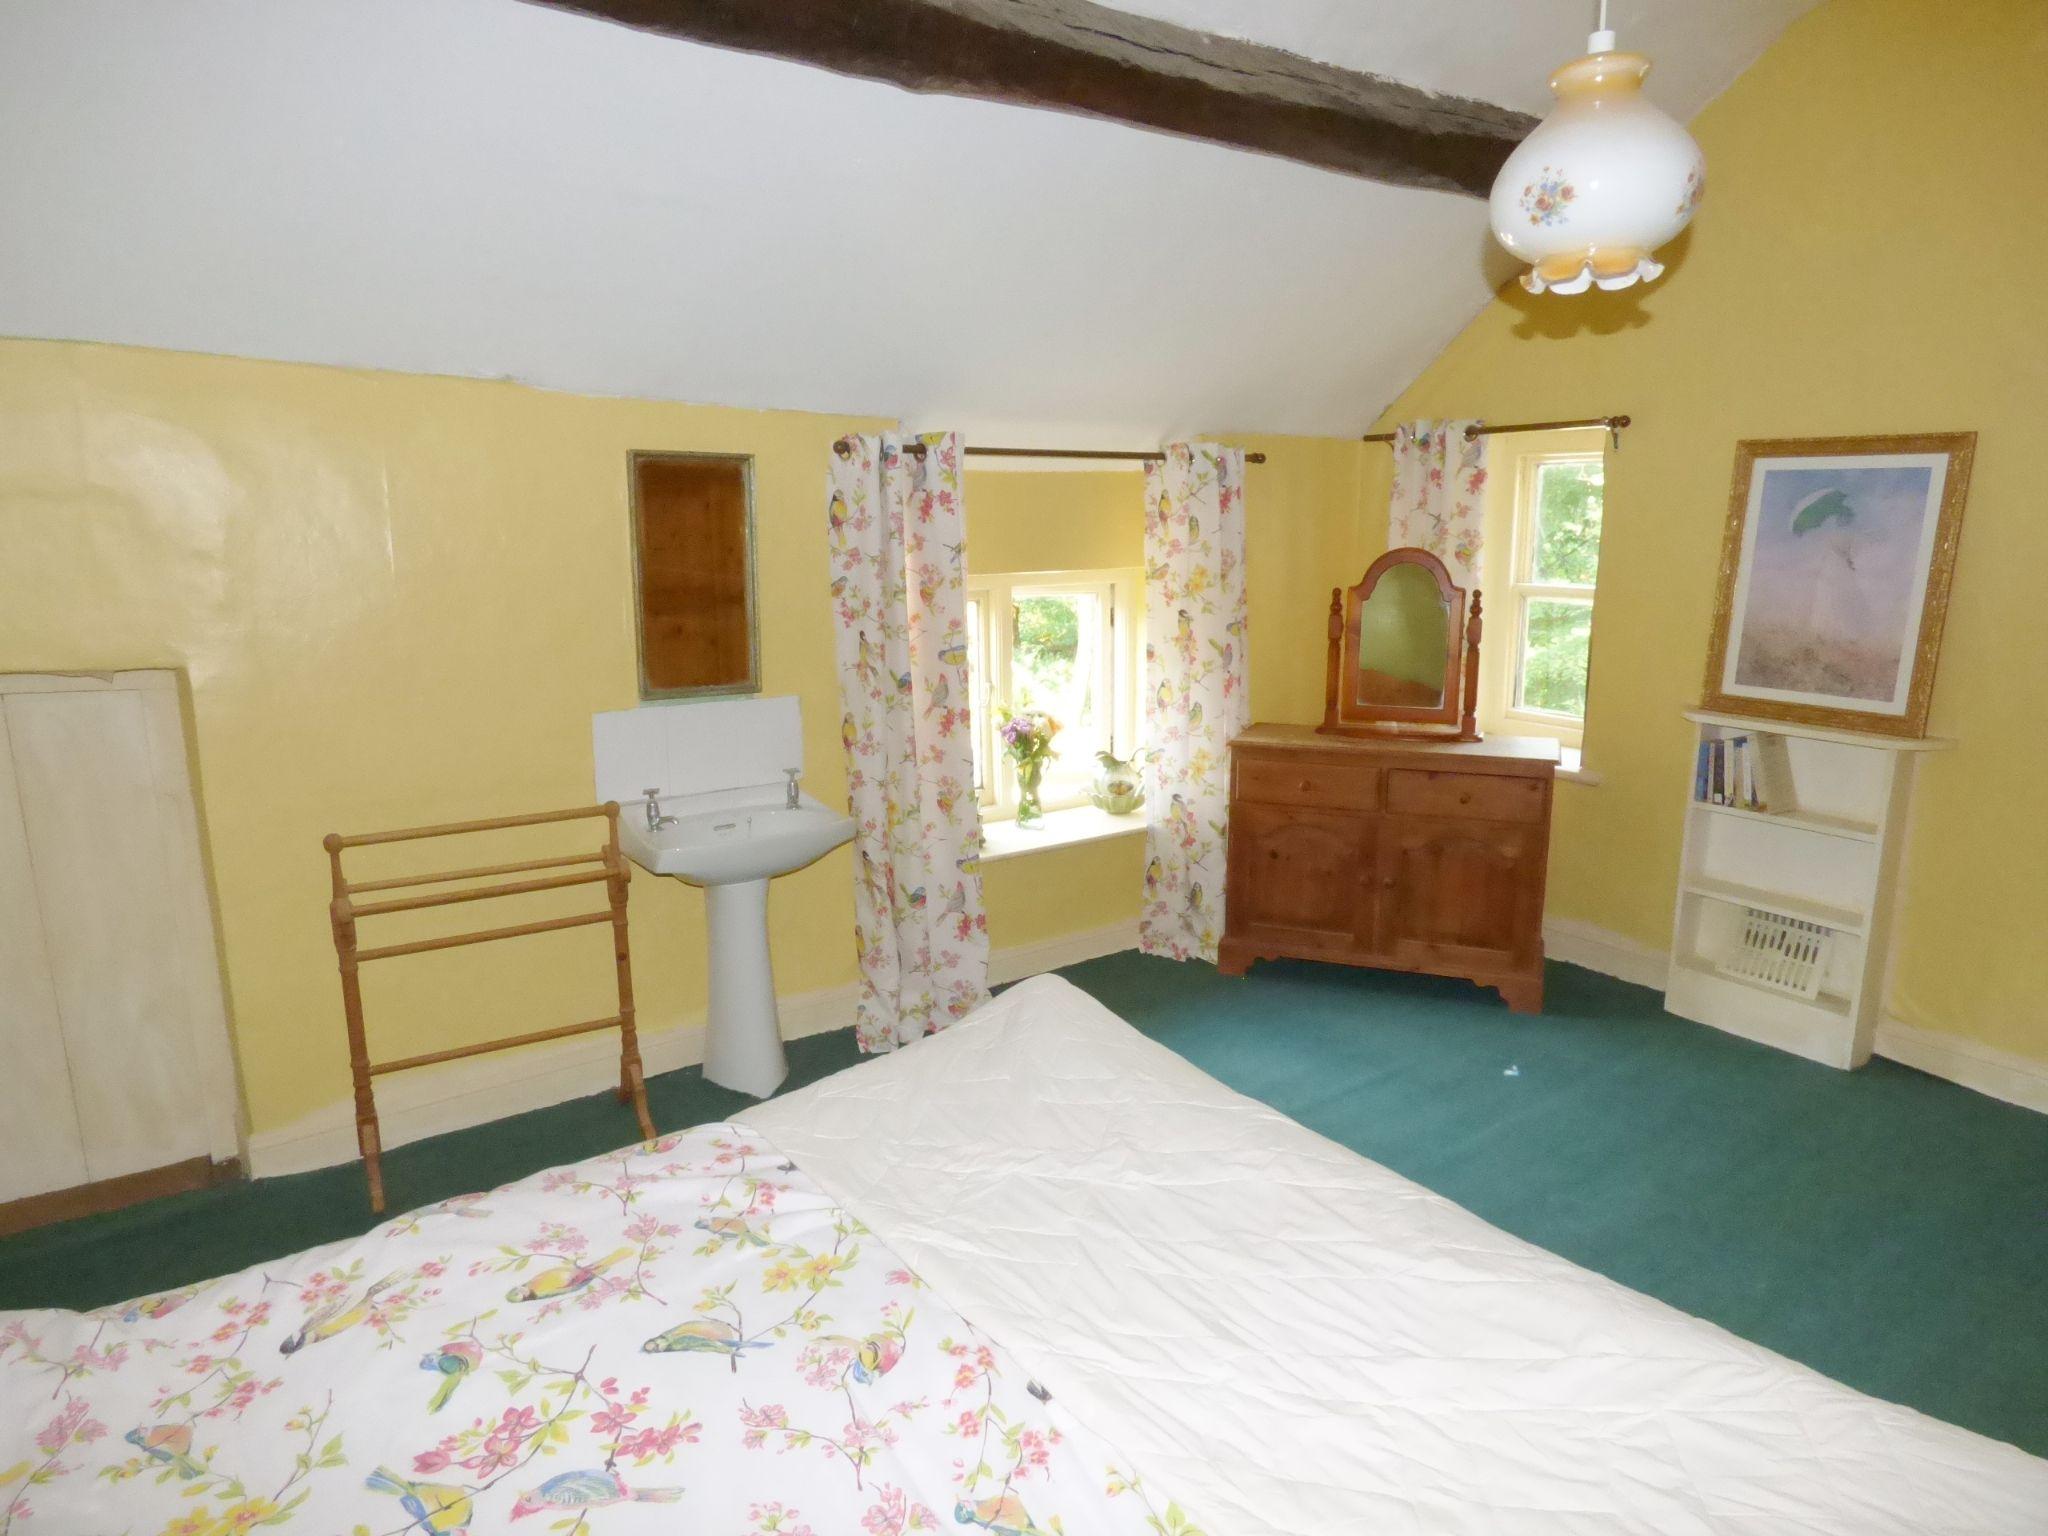 6 Bedroom Detached House For Sale - Bedroom Four